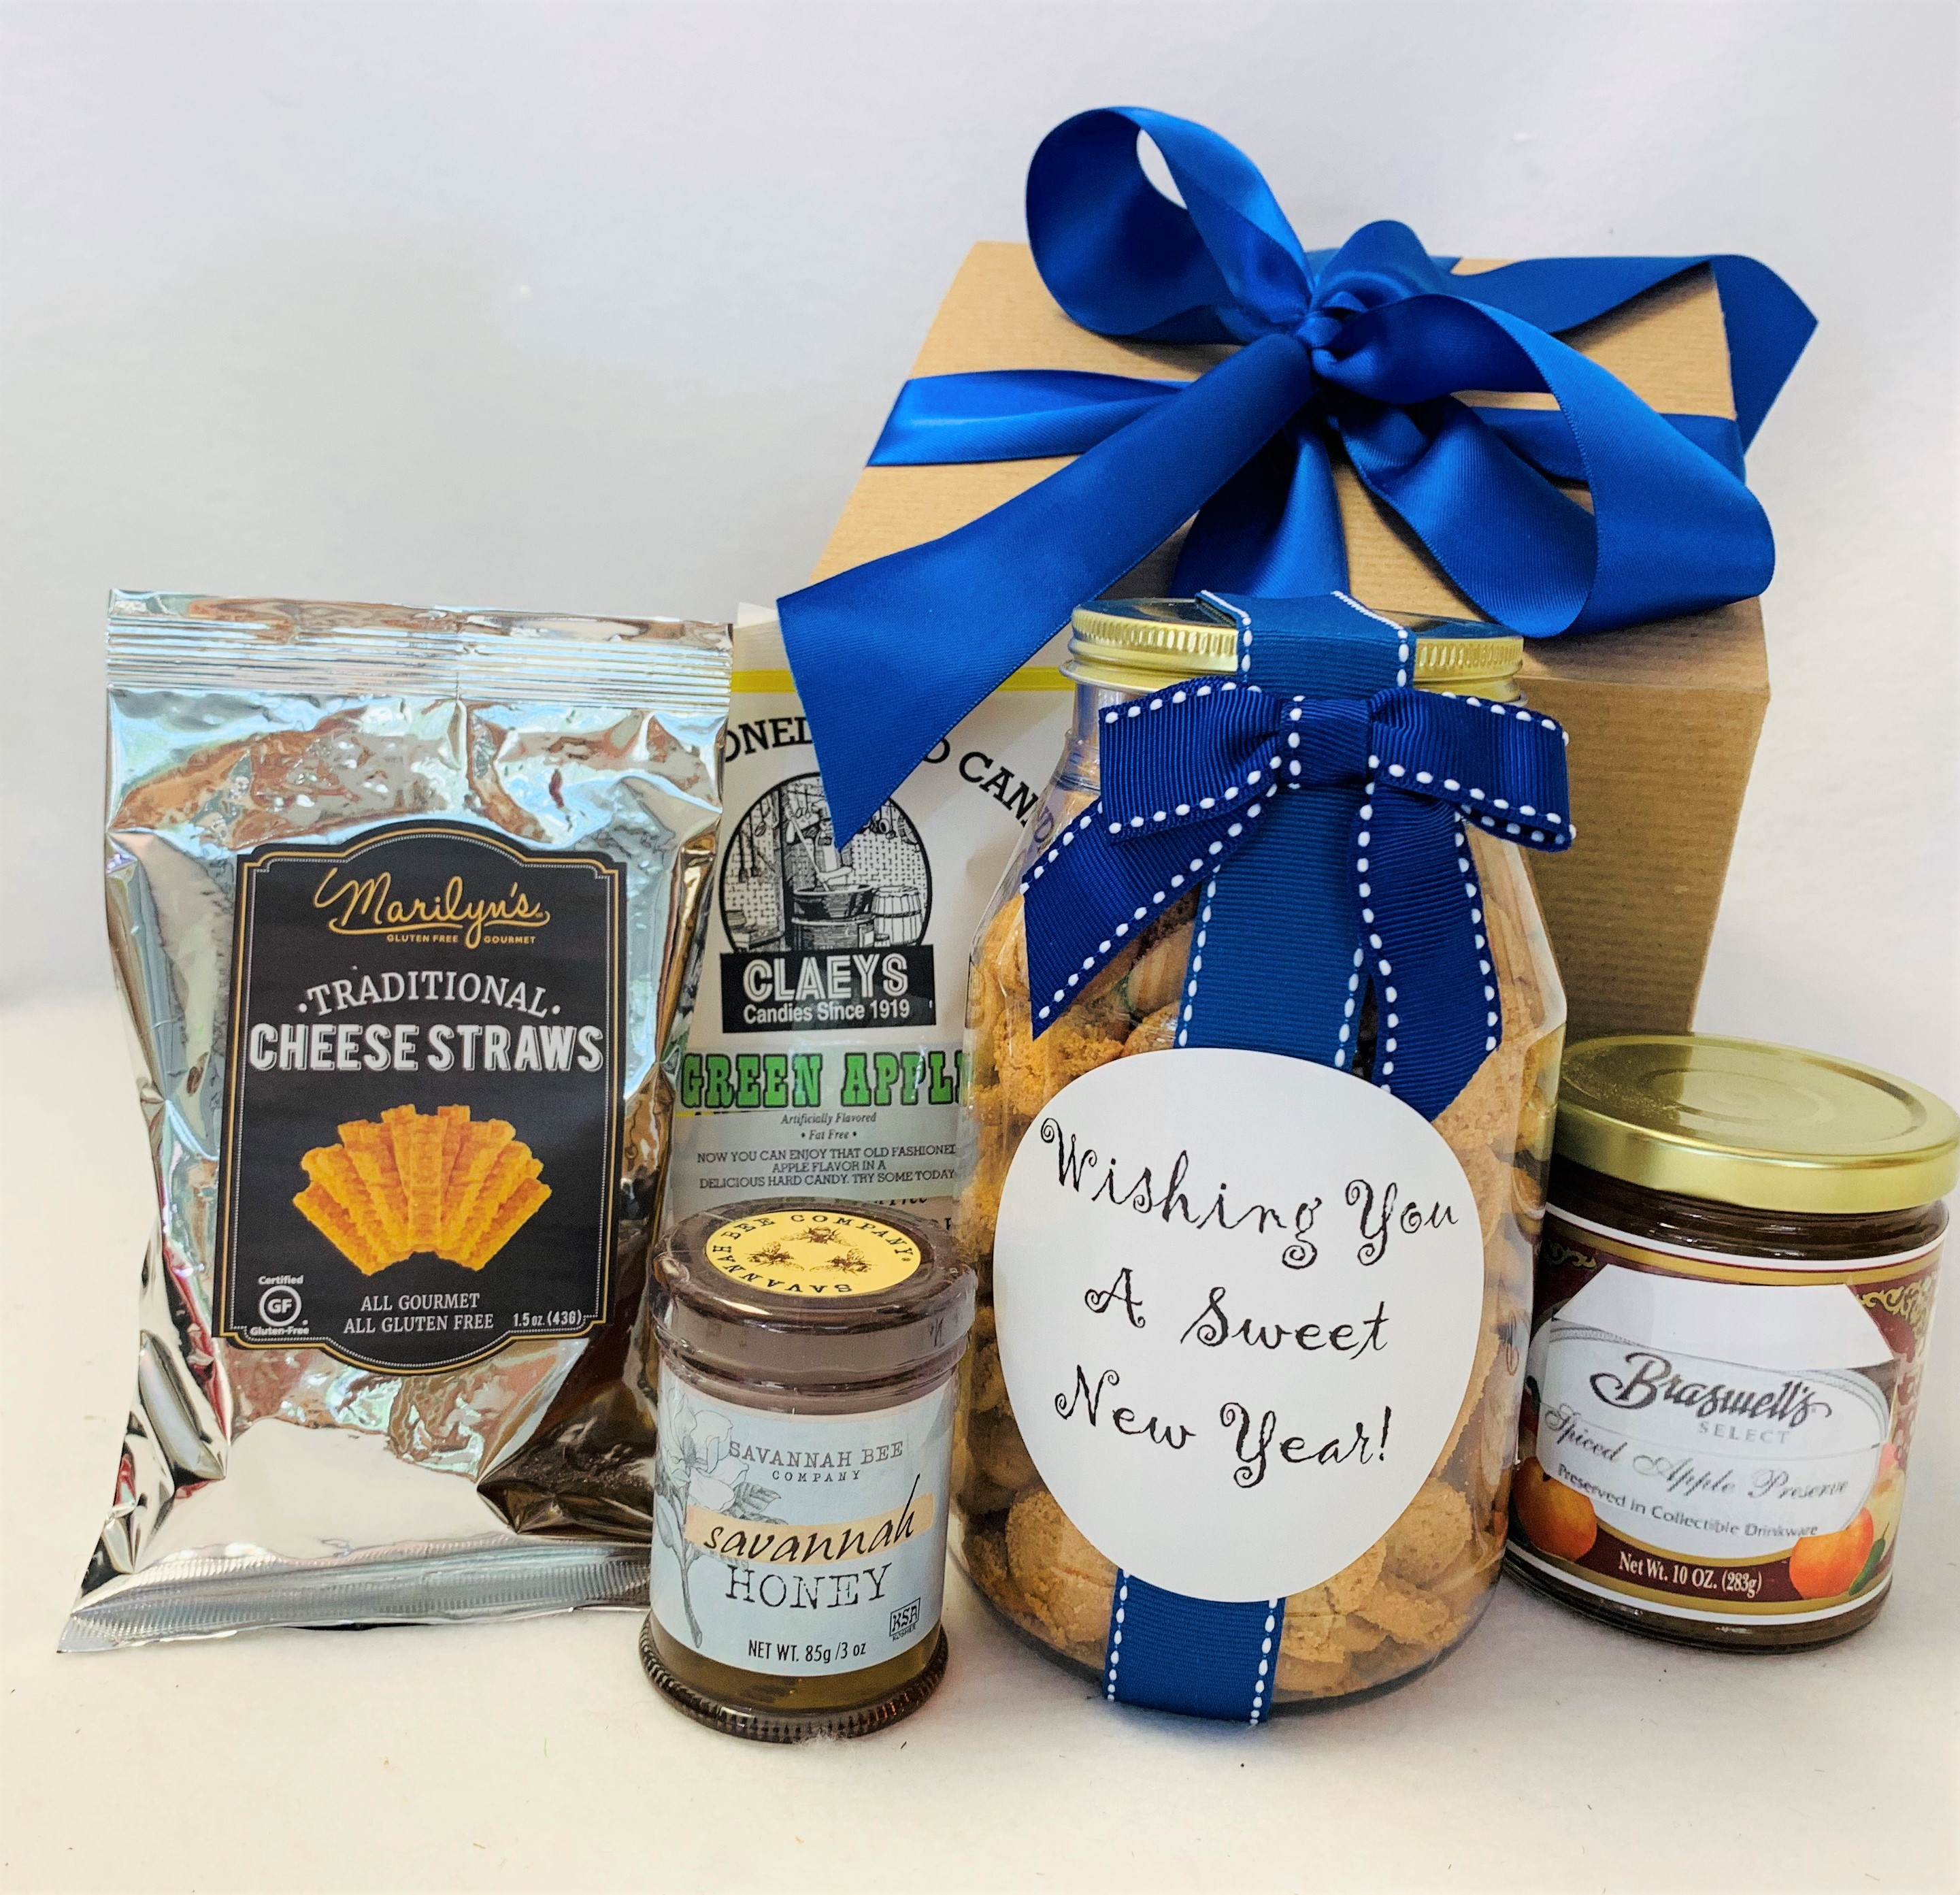 Sensational Jewish New Year Gifts